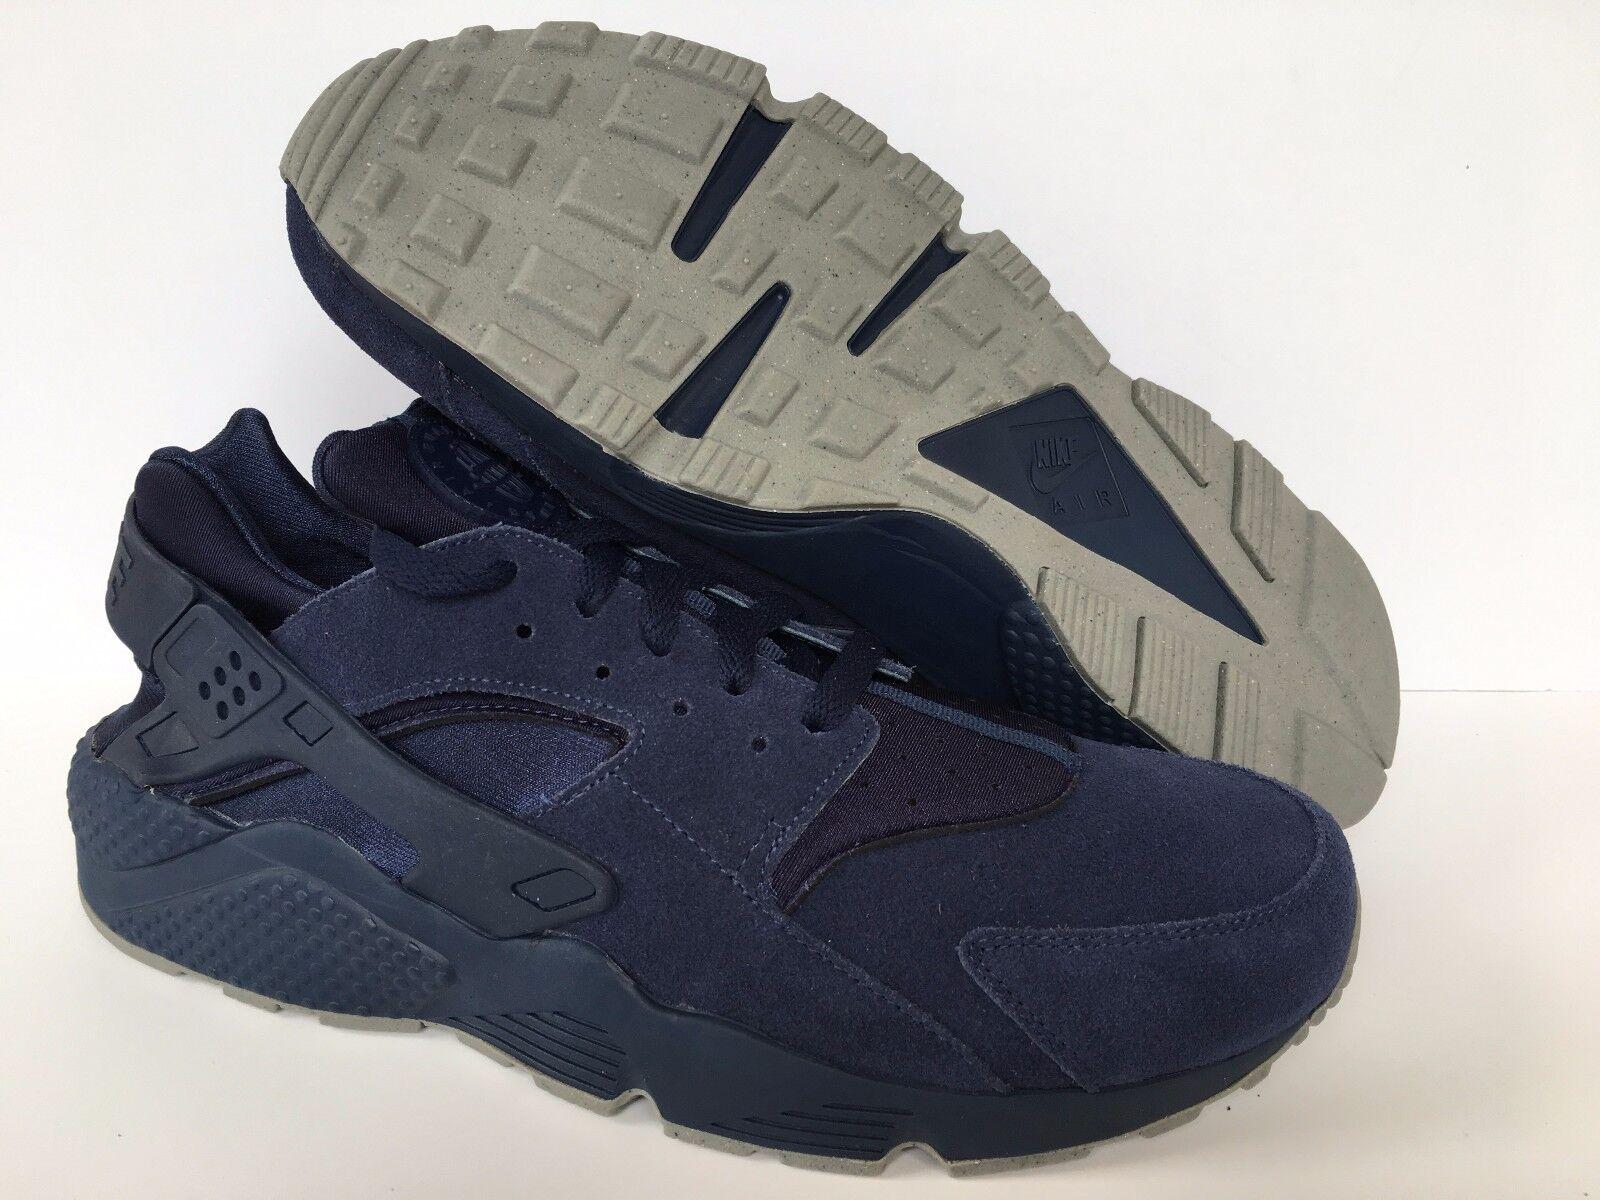 Nike Air Huarache courir iD NikeiD Bleu Leather homme 777330 989 Sz 14